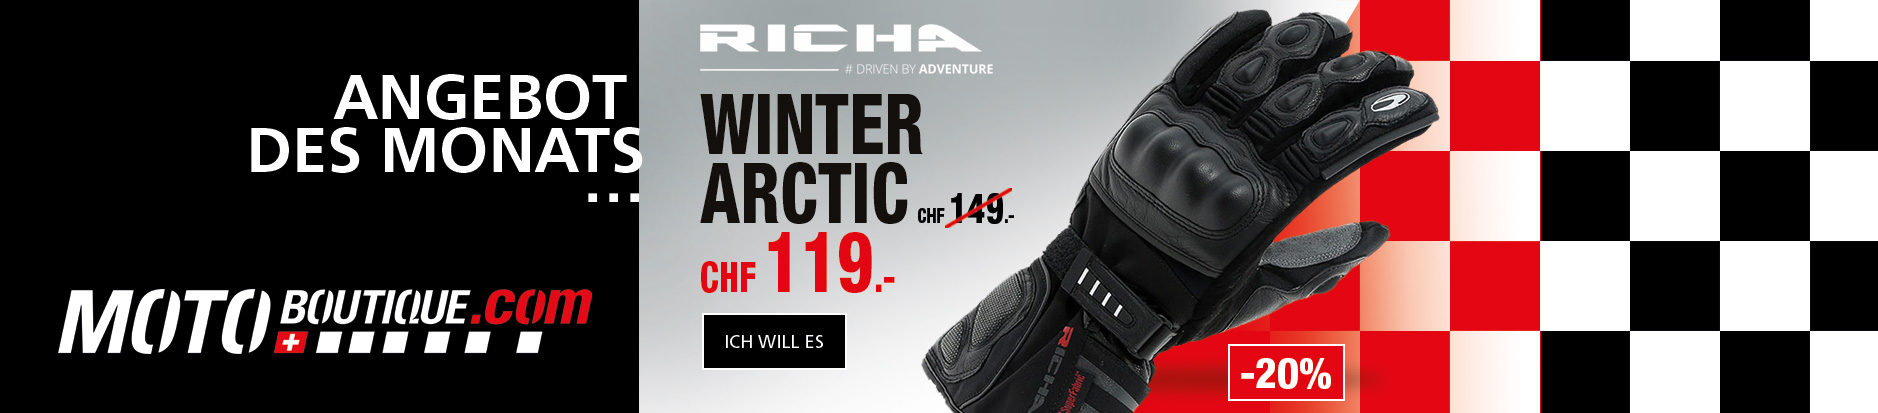 Angebot des monat winter handshuhe Richa Arctic